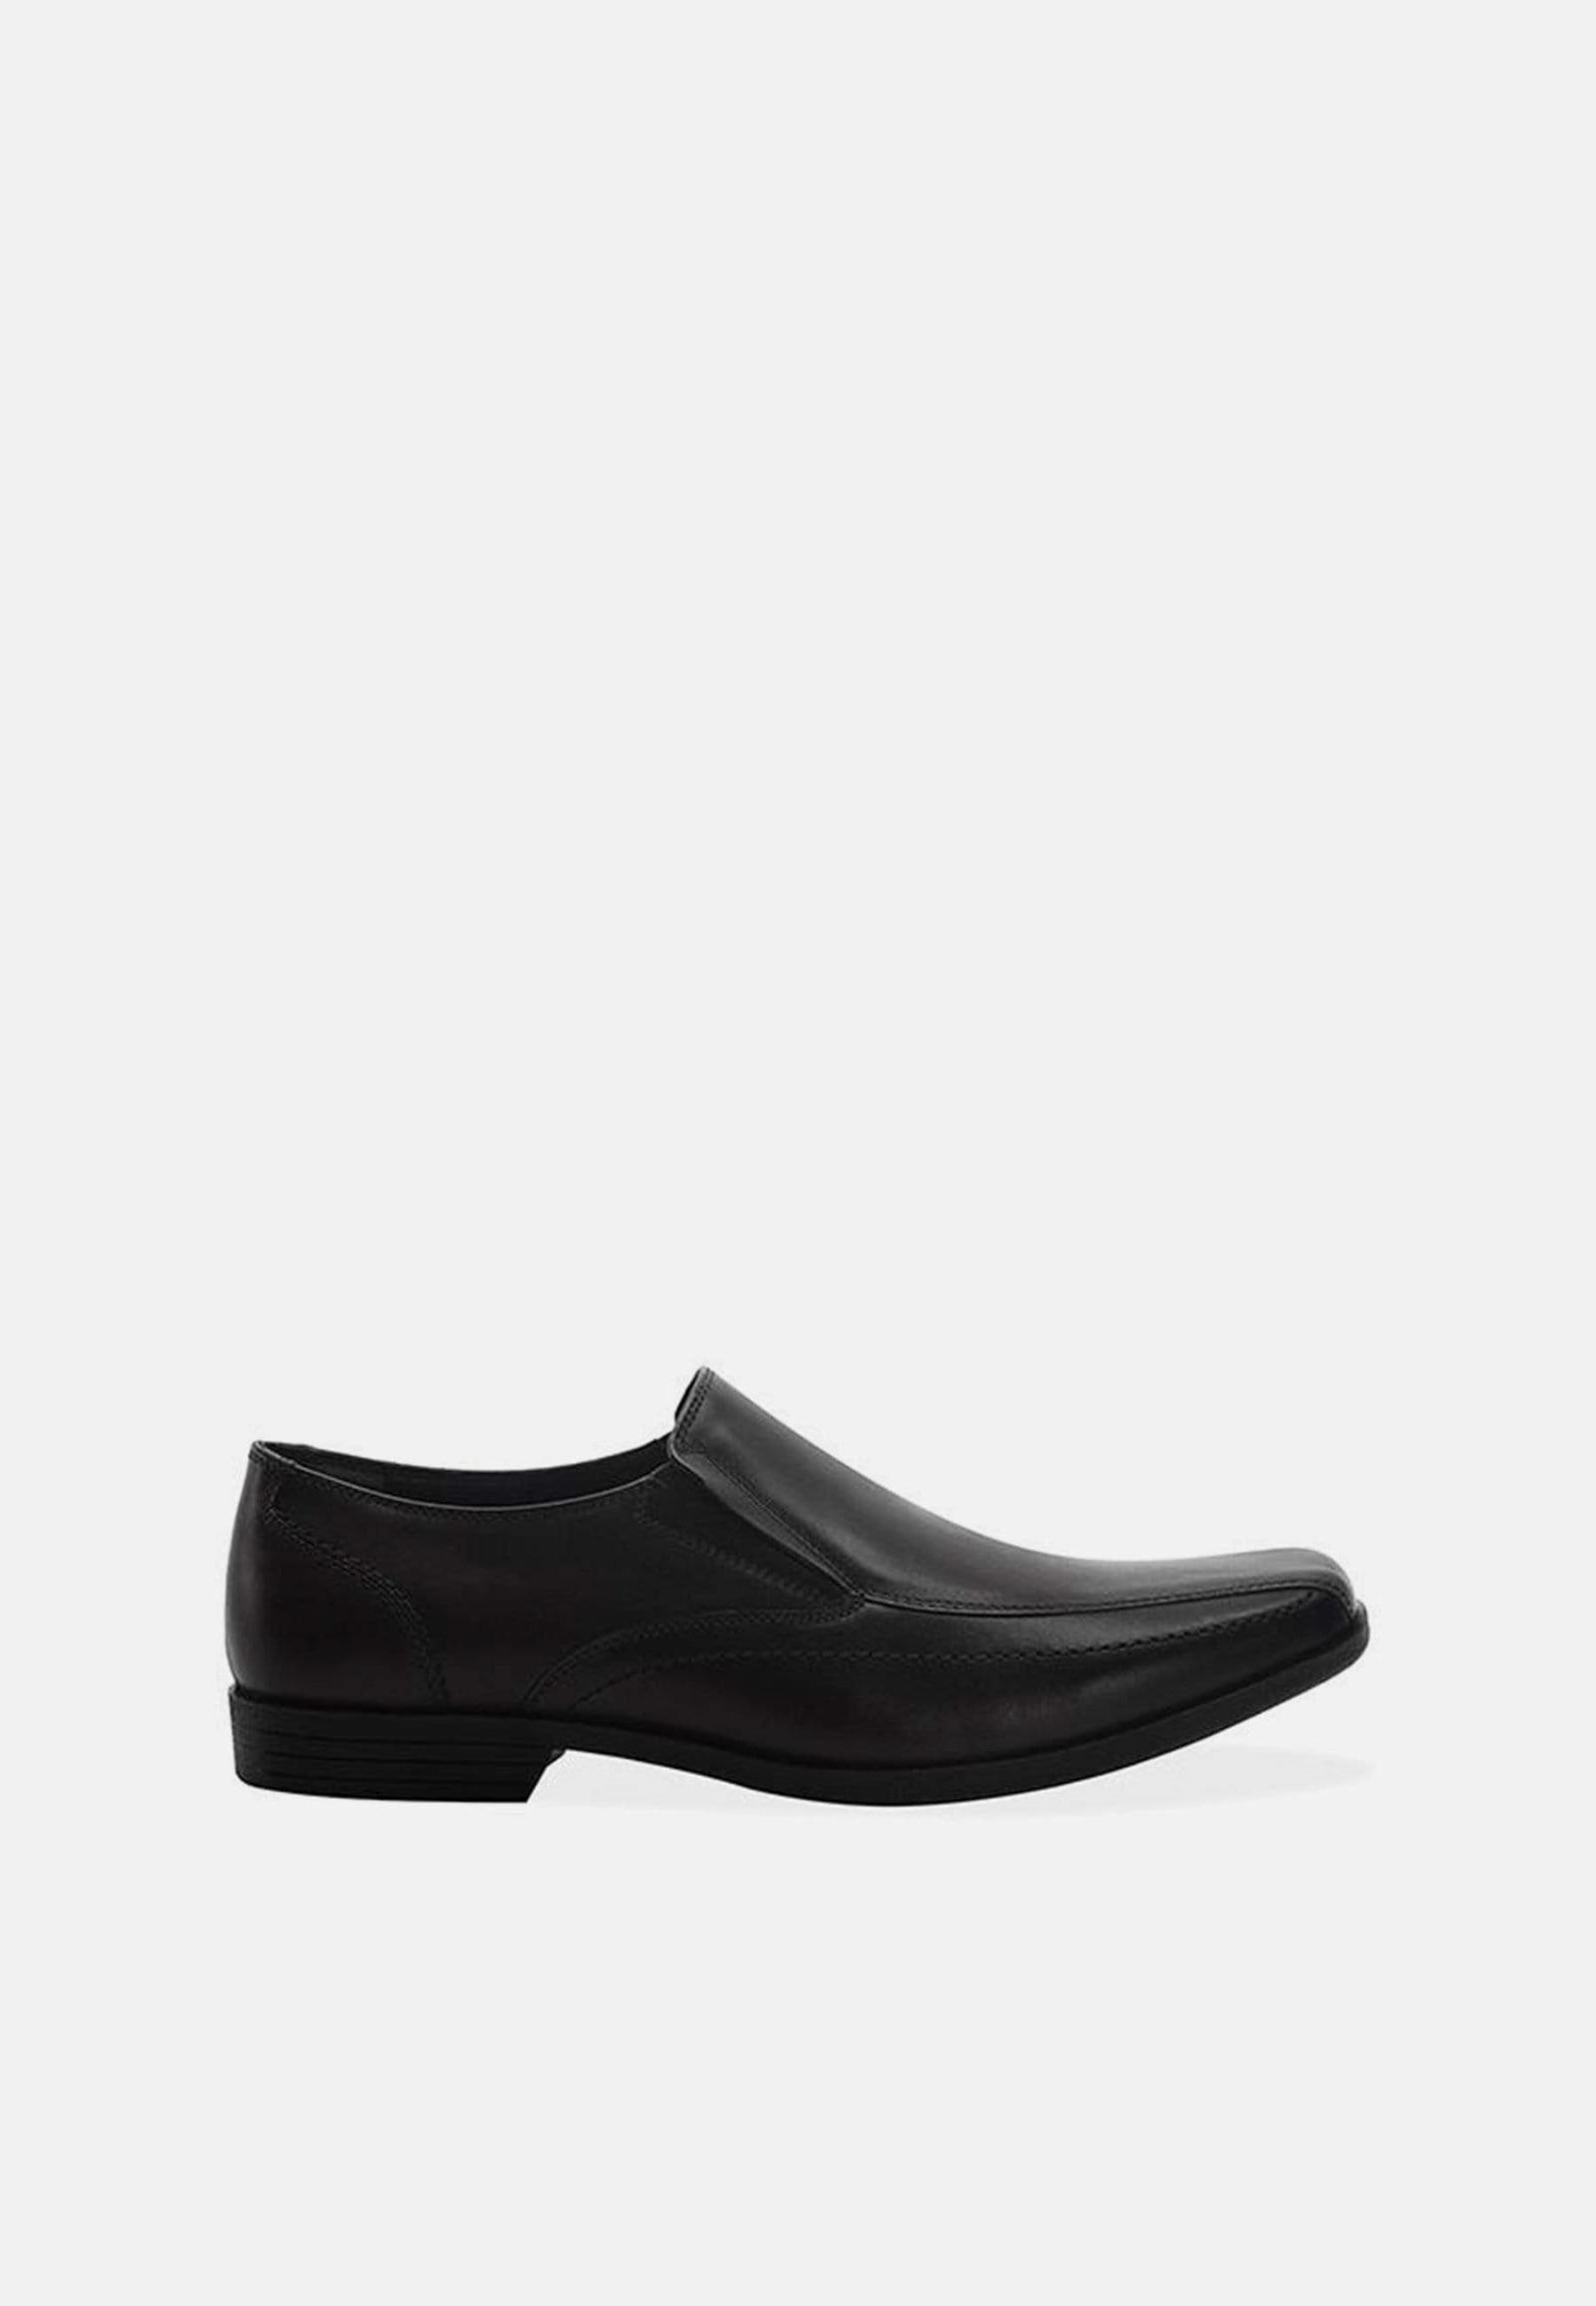 Redfoot Joseph Black Leather Formal Shoe